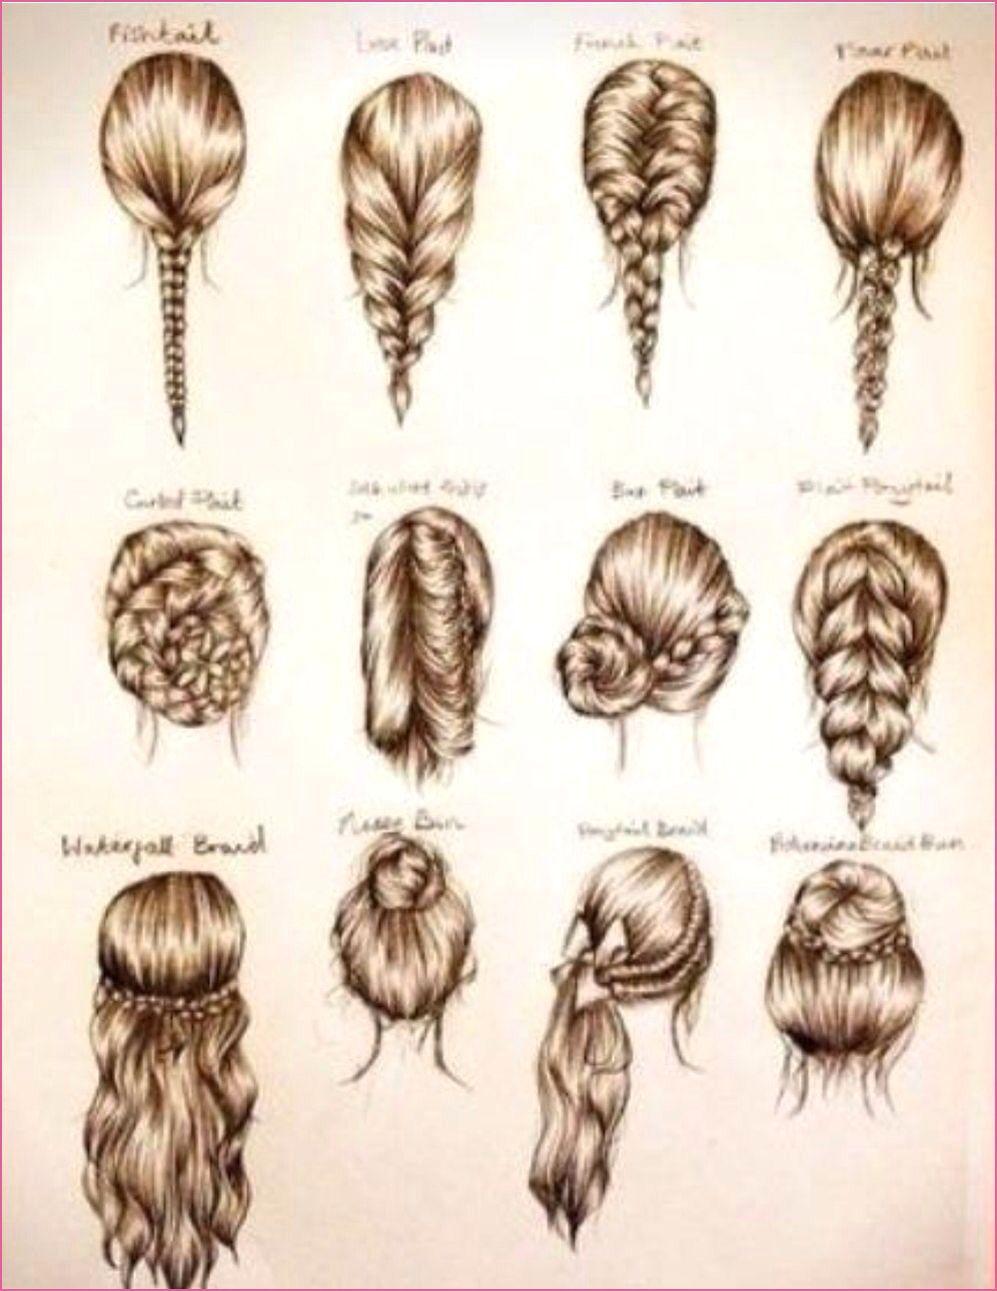 Nett Tumblr Frisuren Anleitung In 2020 Types Of Hair Braids Medium Hair Styles Braided Hairstyles